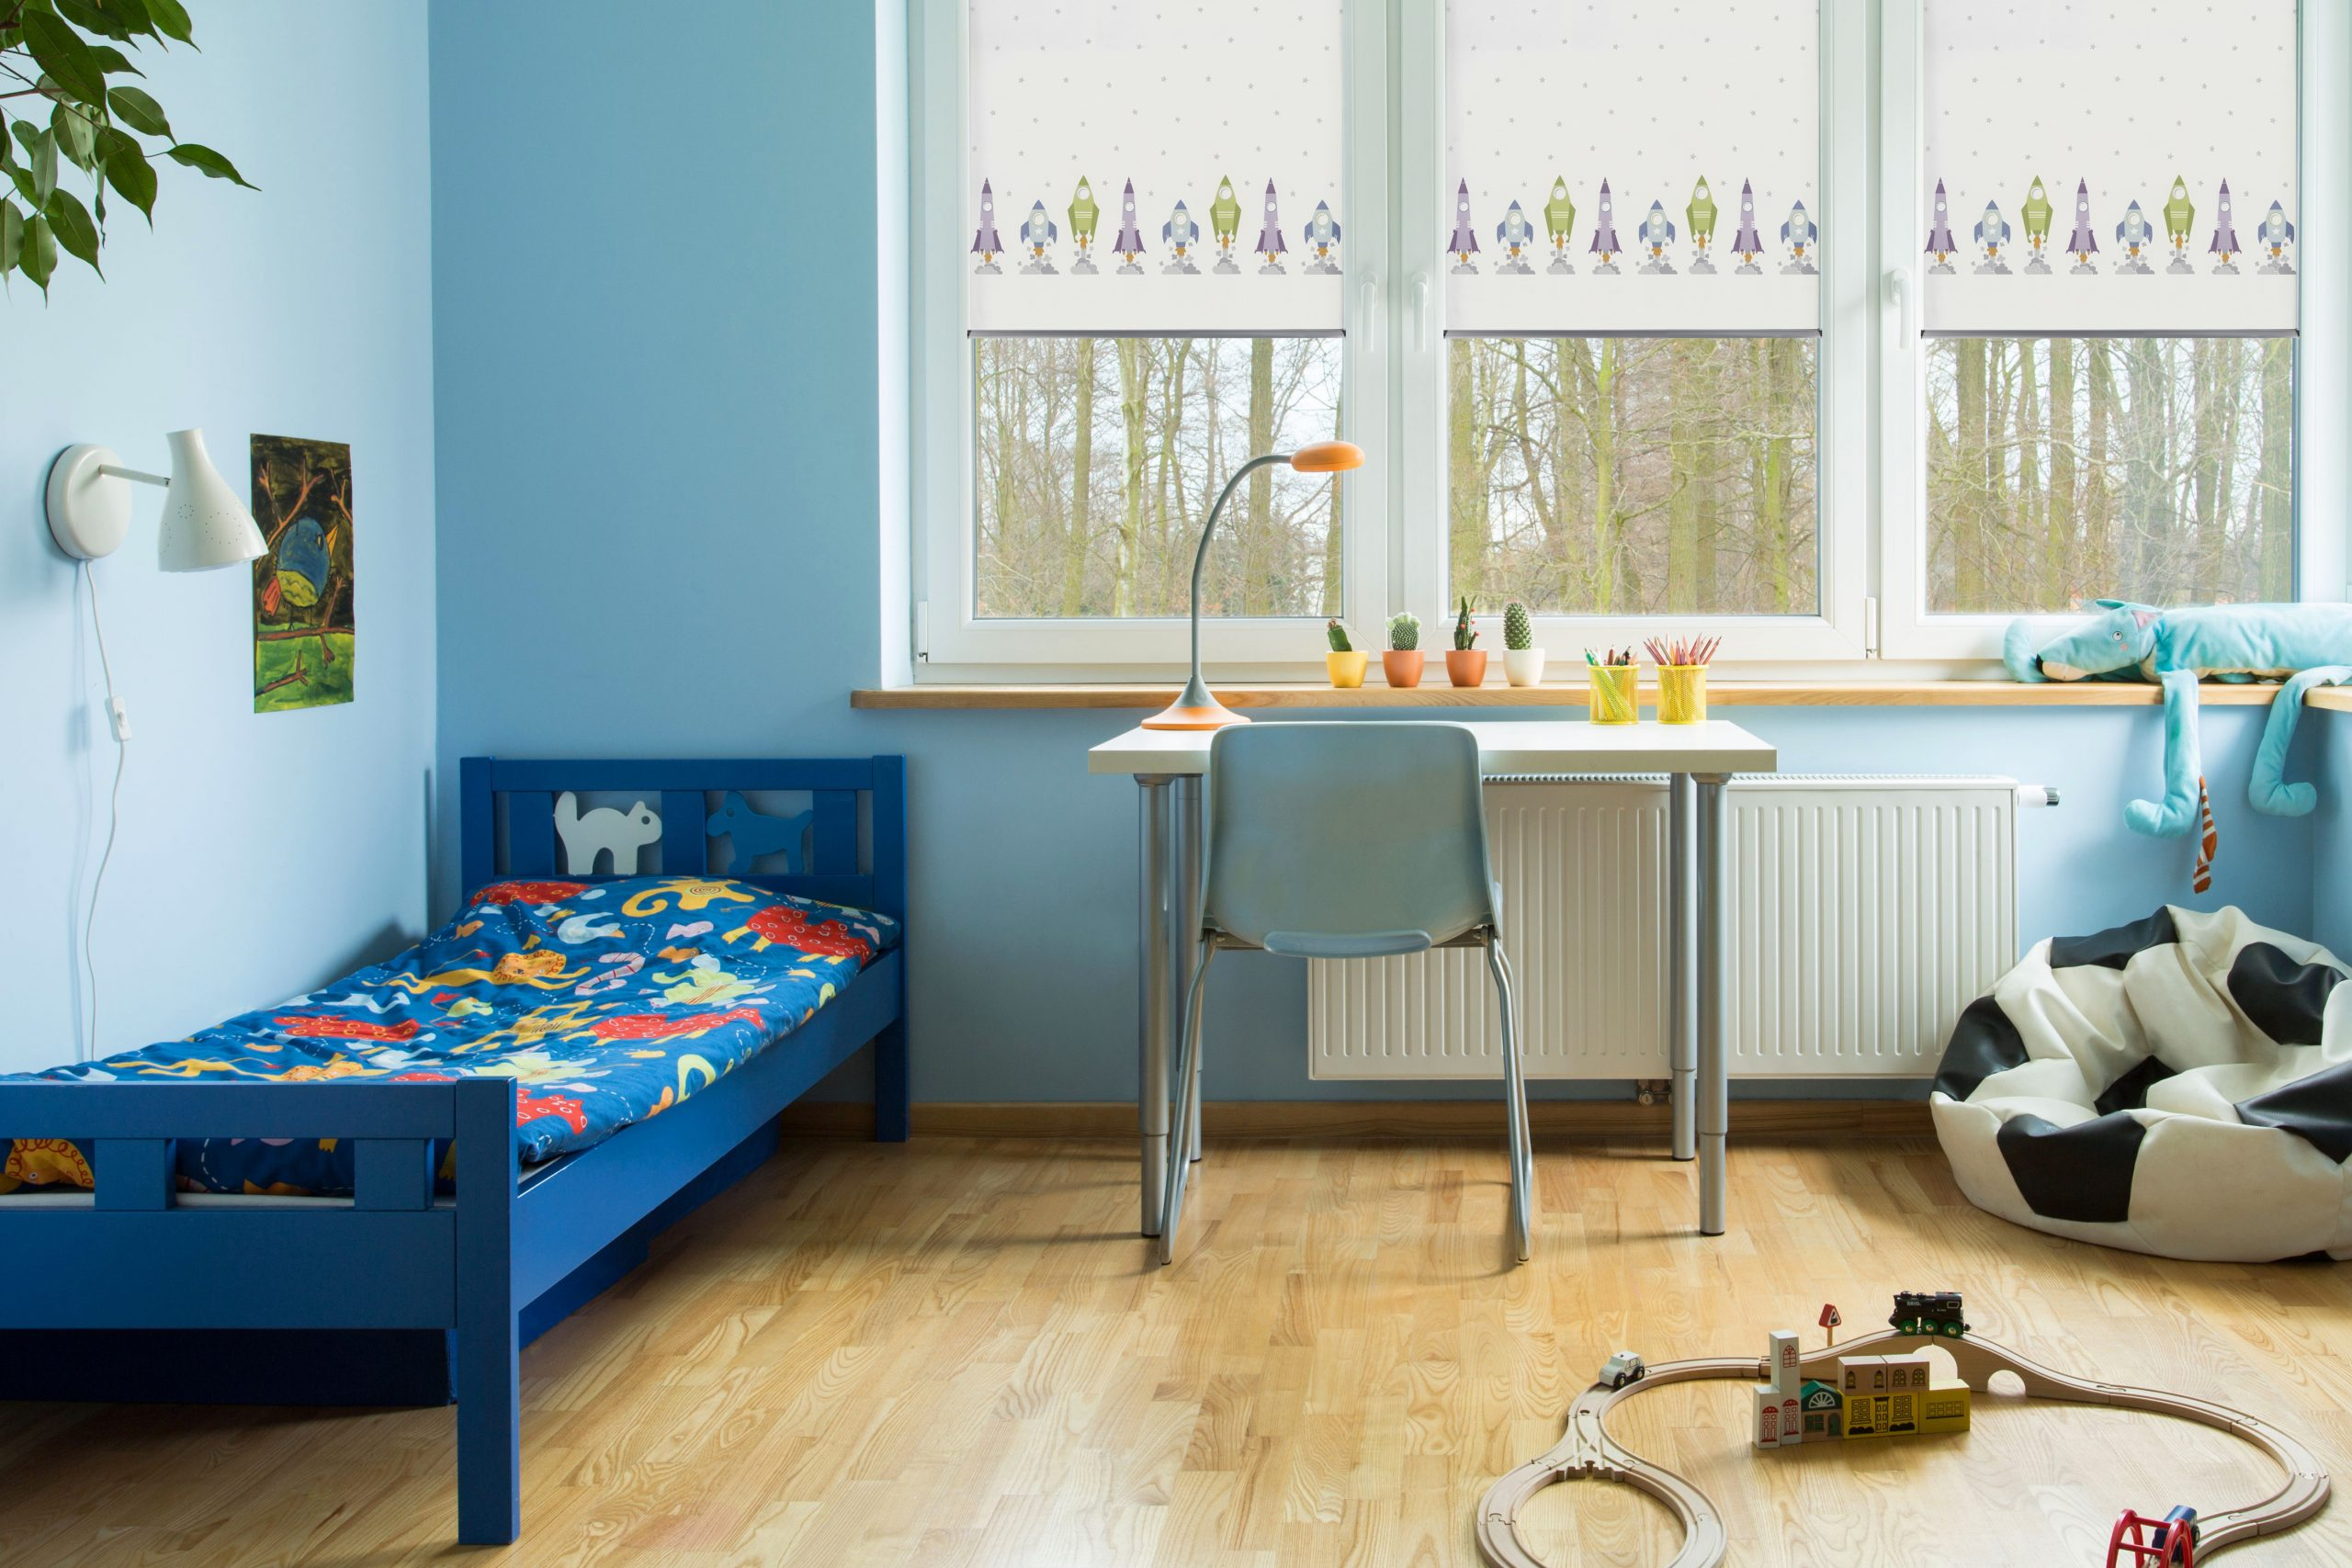 Blinds for childrens bedrooms